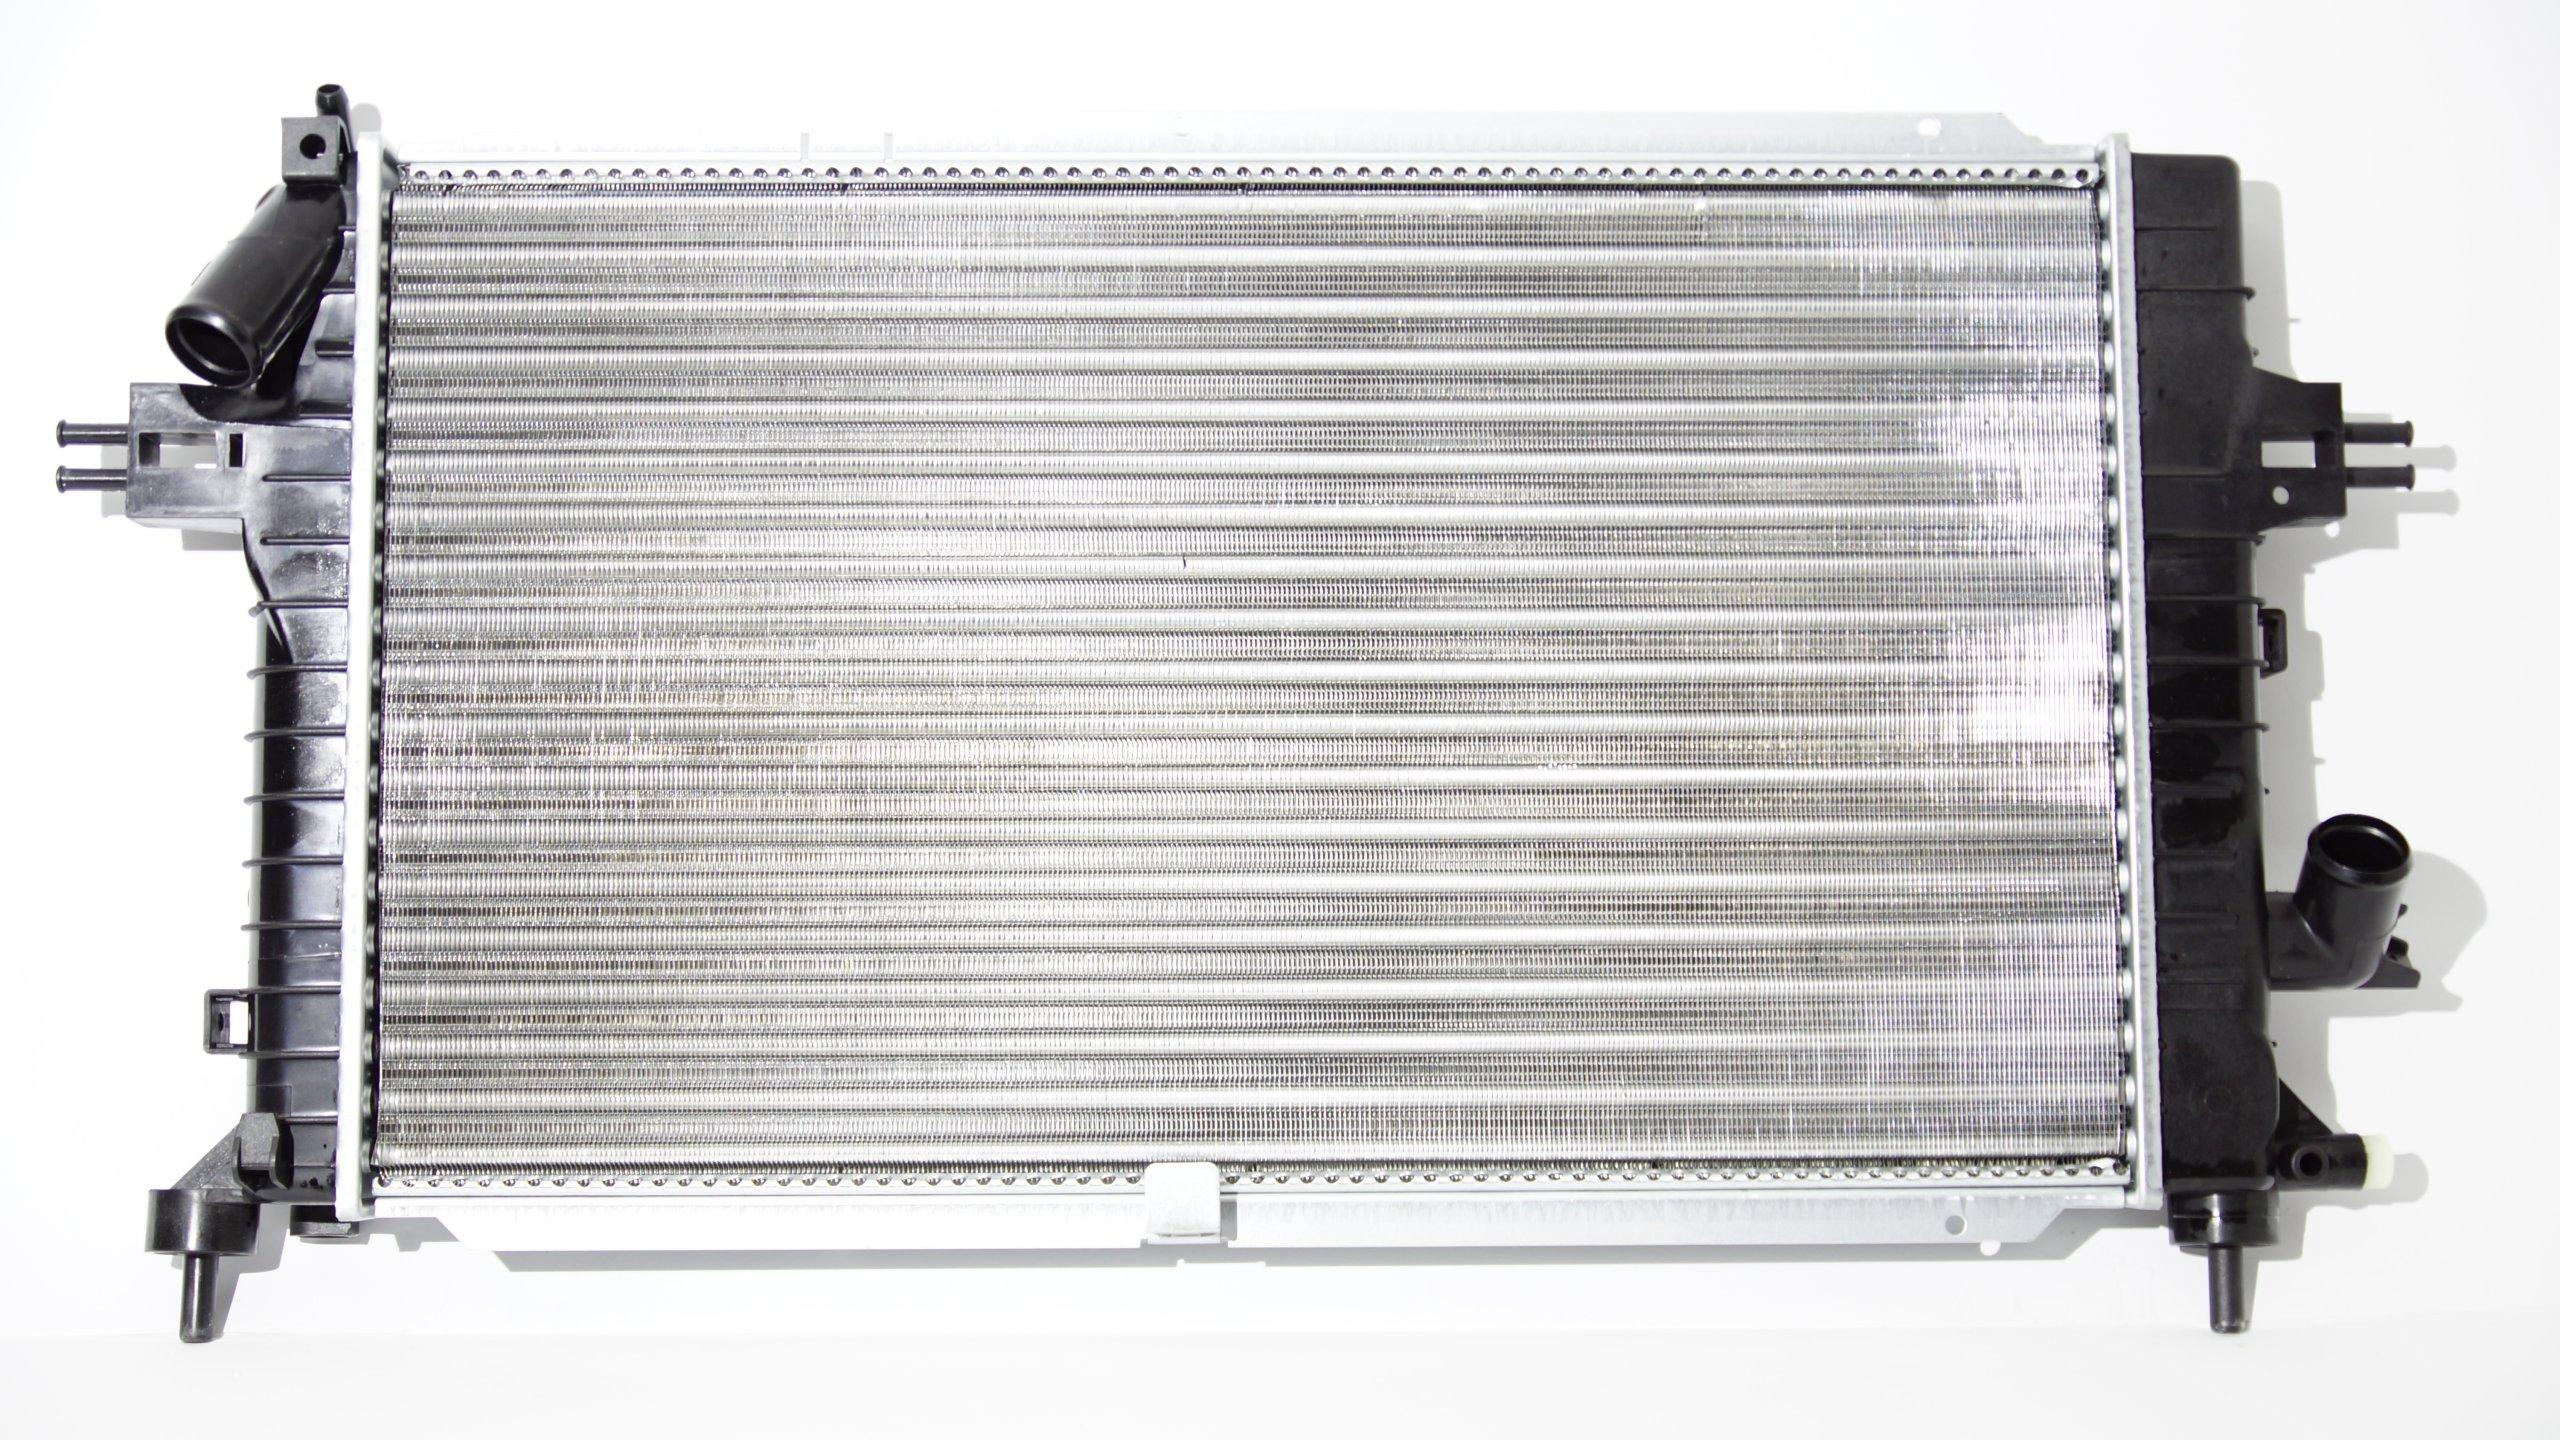 радиатор воды opel astra h   zafira b cdti новая